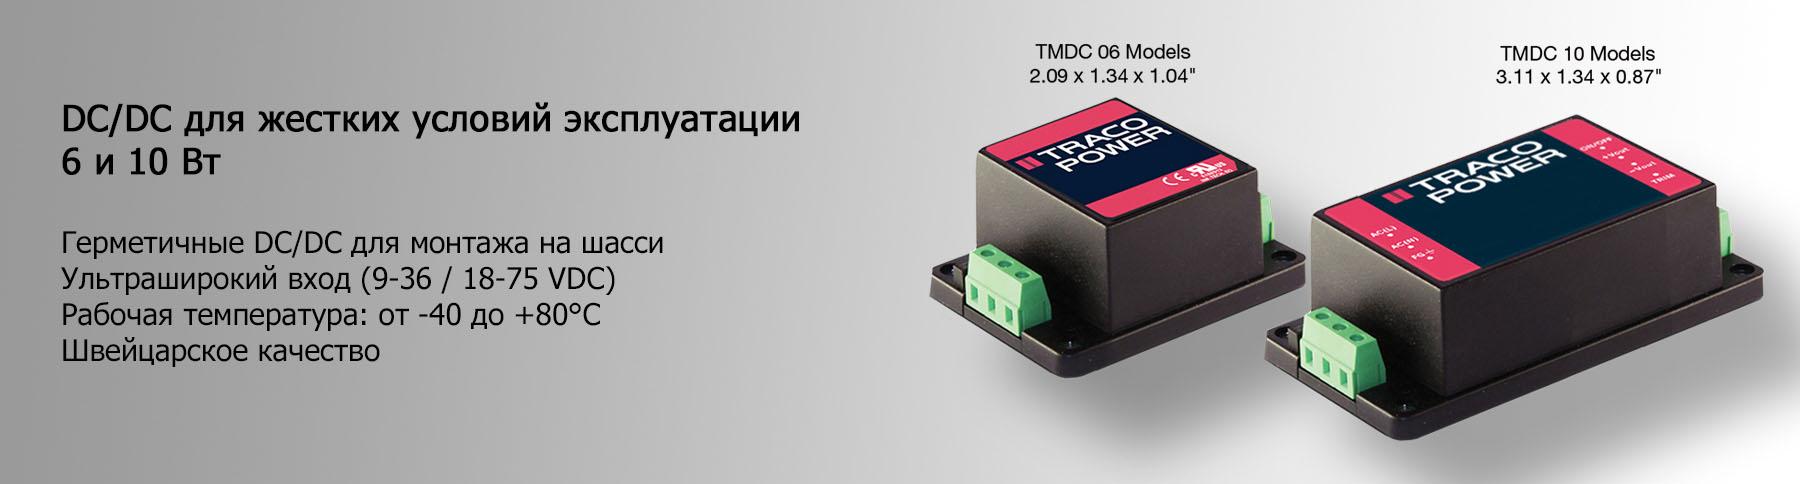 TMDC 06 и TMDC 10 - DC/DC преобразователи 6 и 10 Вт для монтажа на шасси